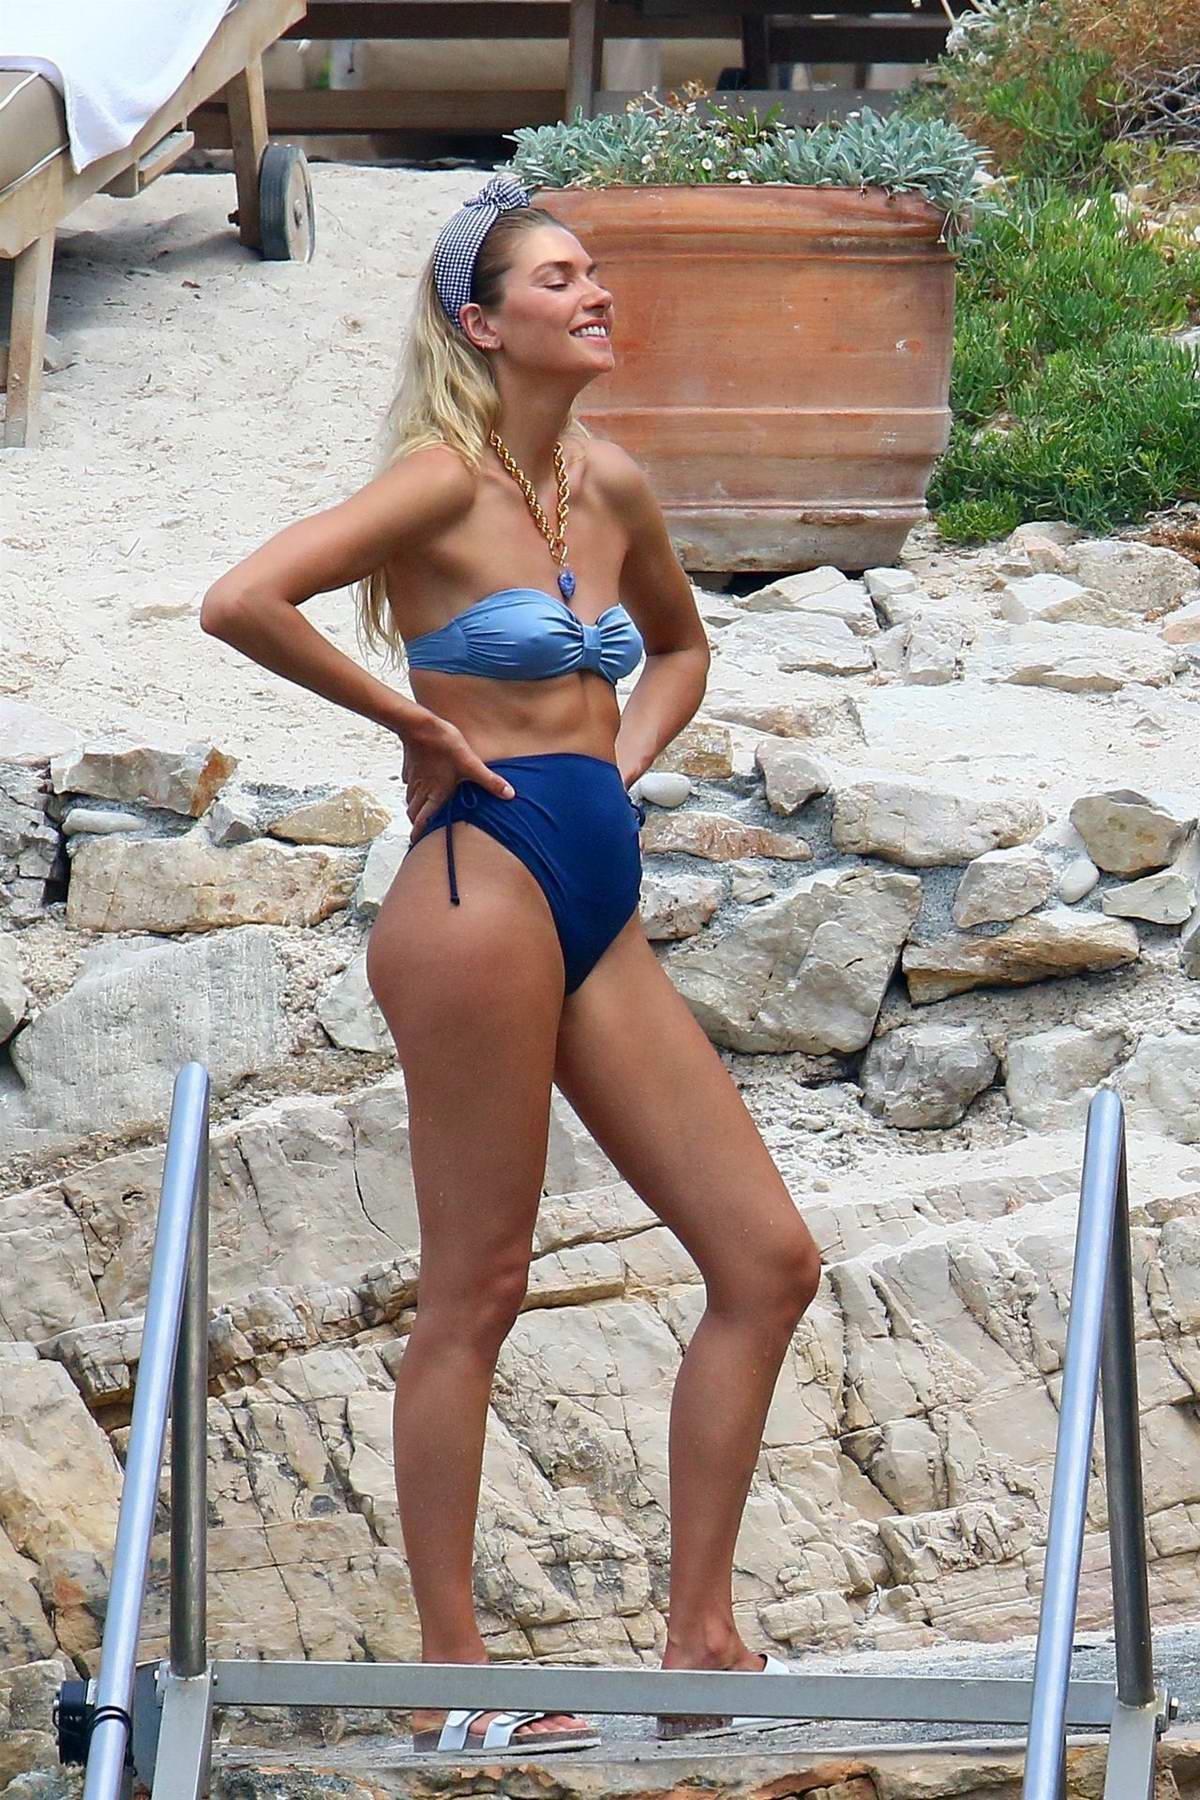 Jessica Hart poses in bikini during a beachwear photoshoot in Cannes, France